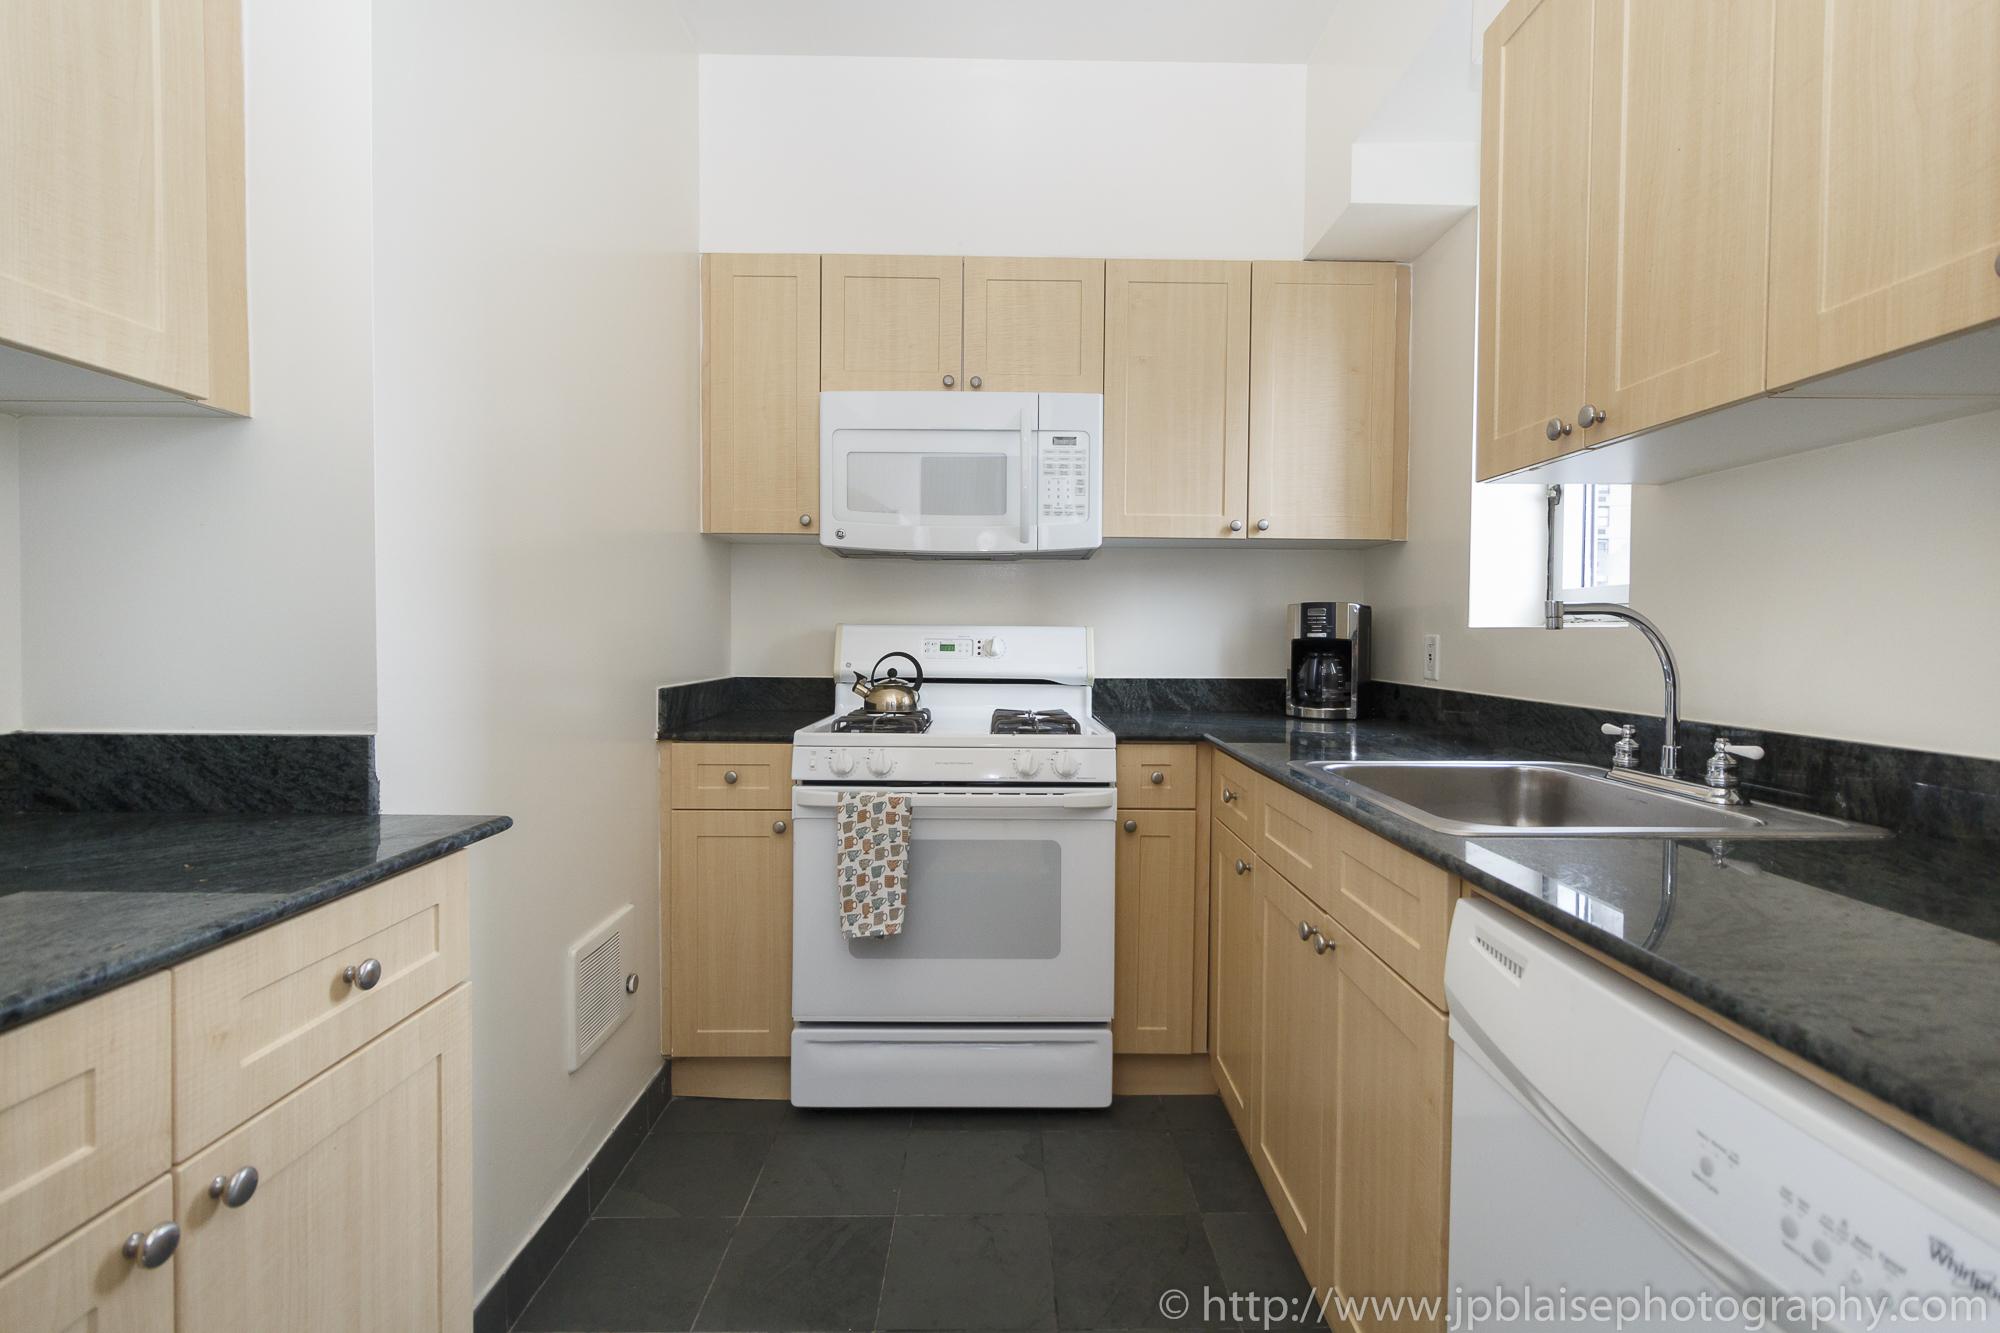 NY apartment photographer real estate airbnb interior midtown manhattan kitchen